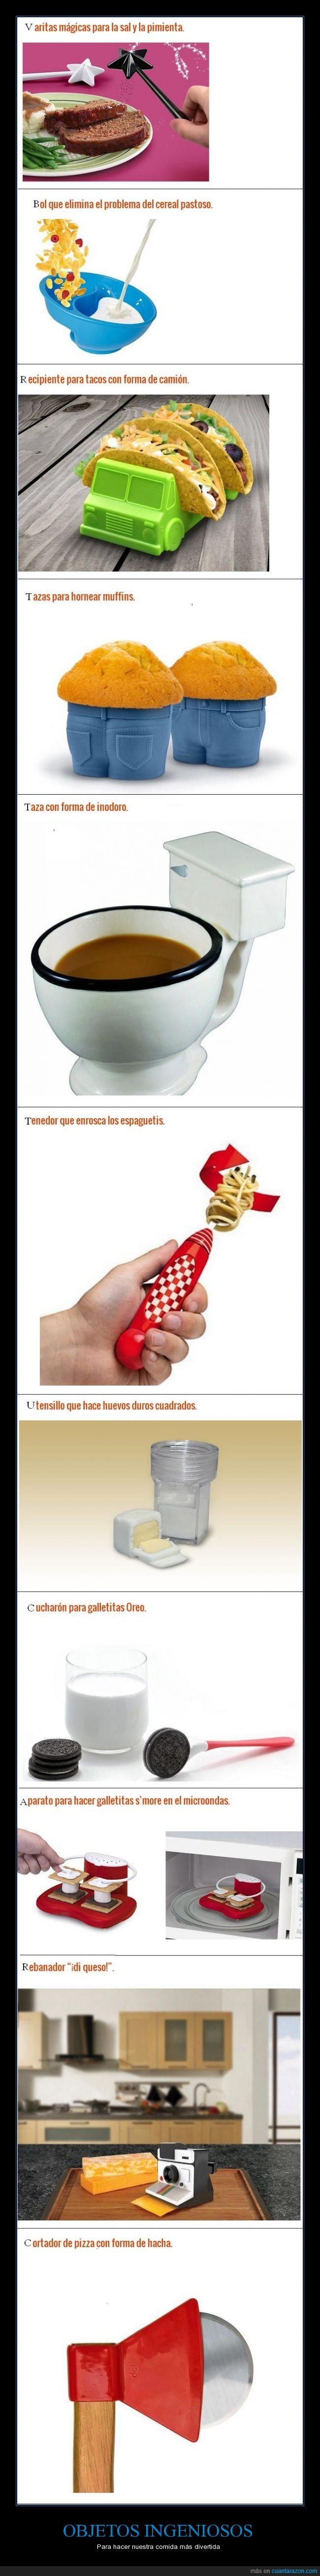 objetos_ingeniosos